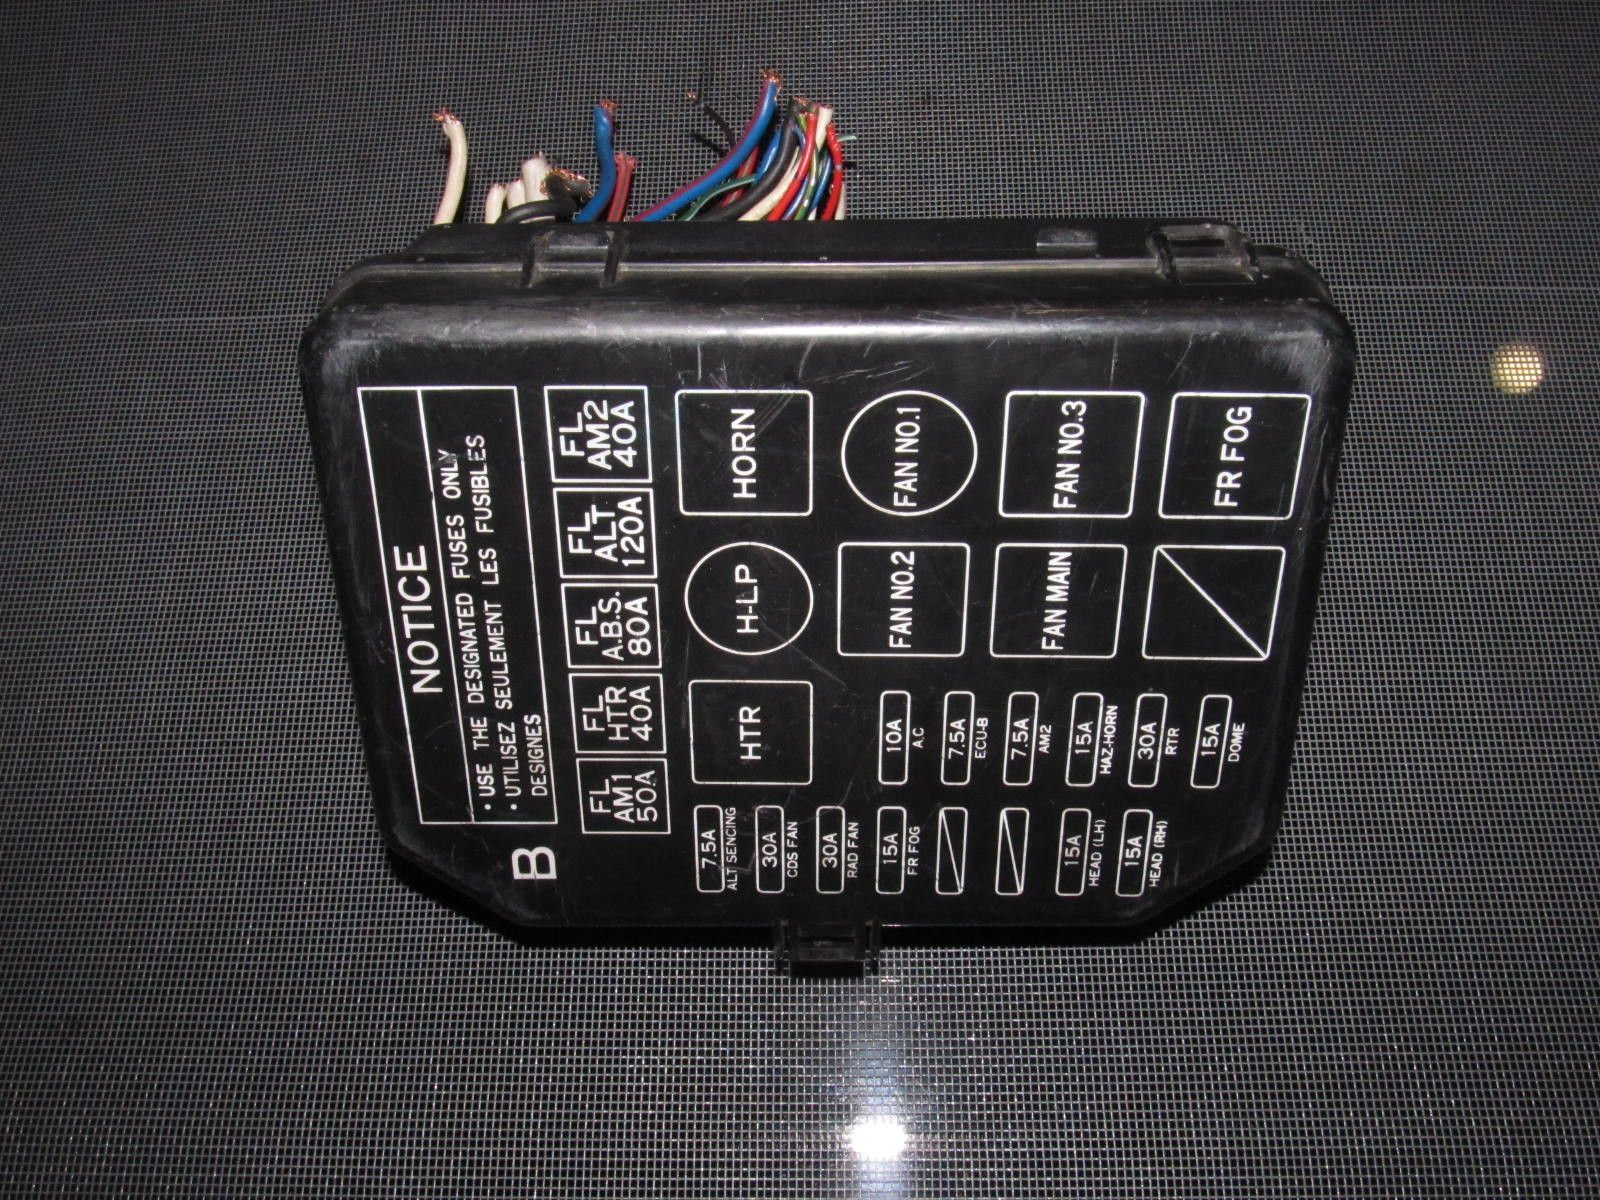 small resolution of 91 95 toyota mr2 oem interior fuse box autopartone com products 2000 f150 fuse box diagram